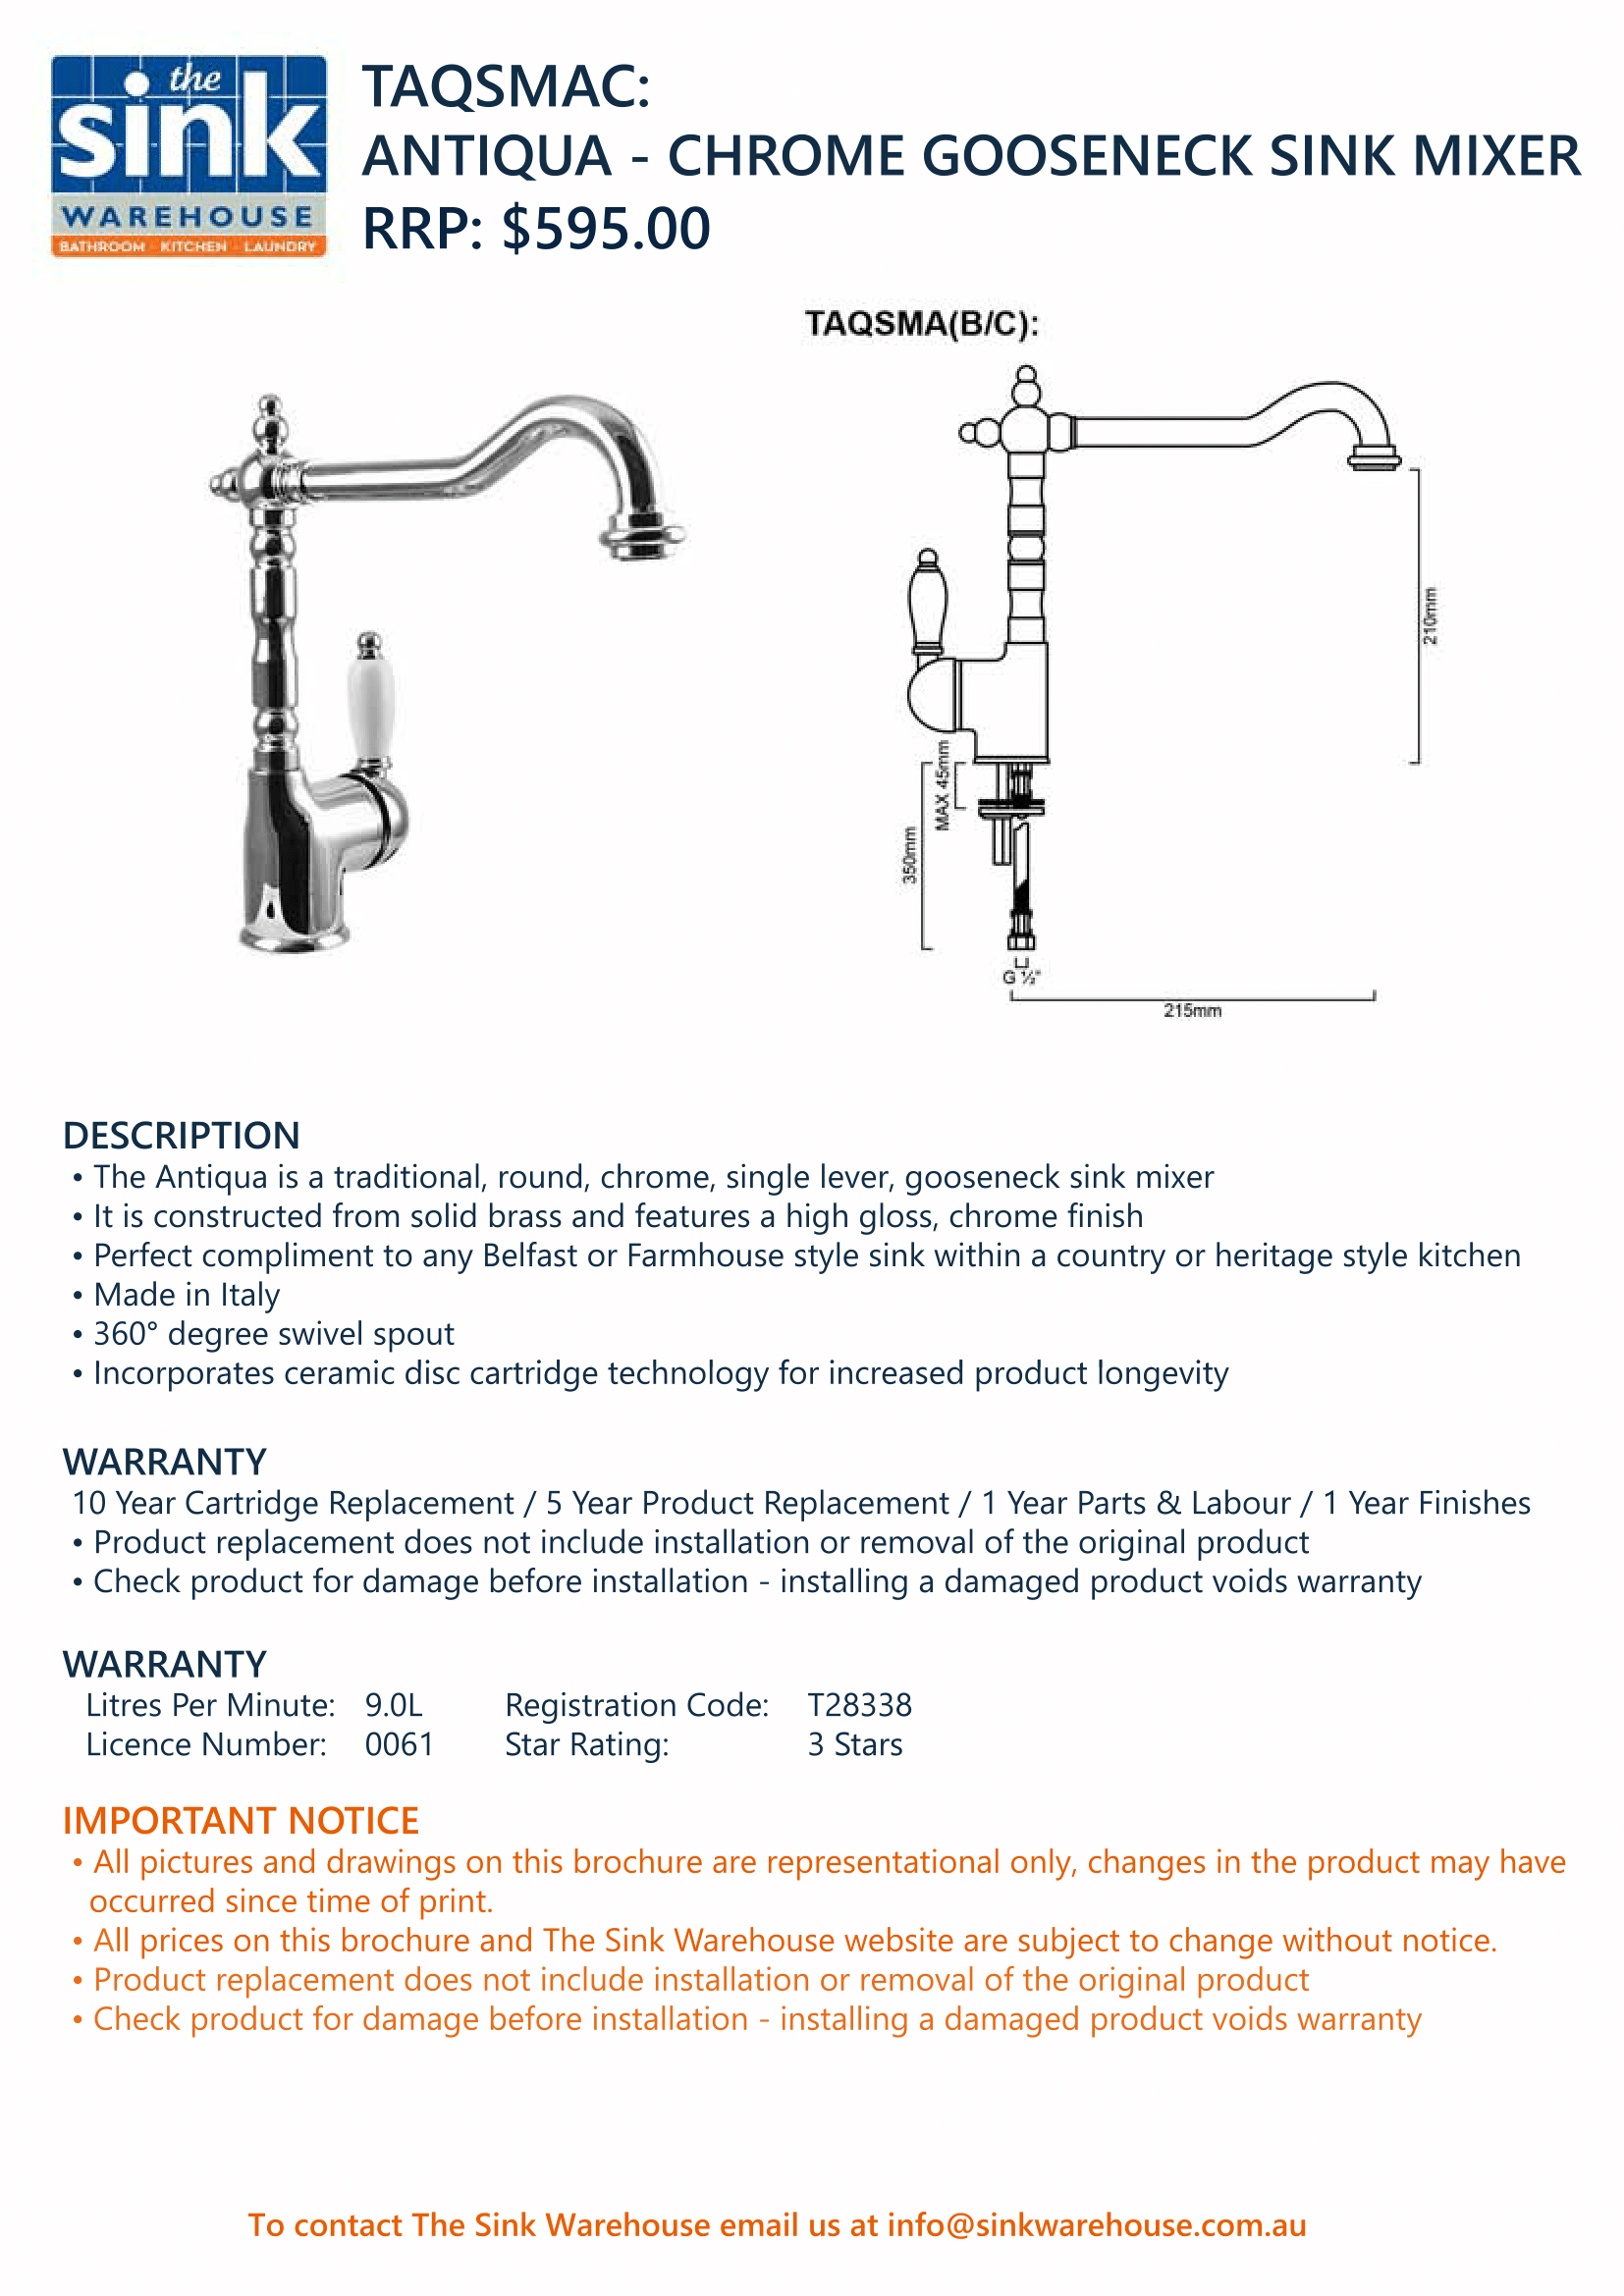 taqsmac-product-spec-sheet-1.png